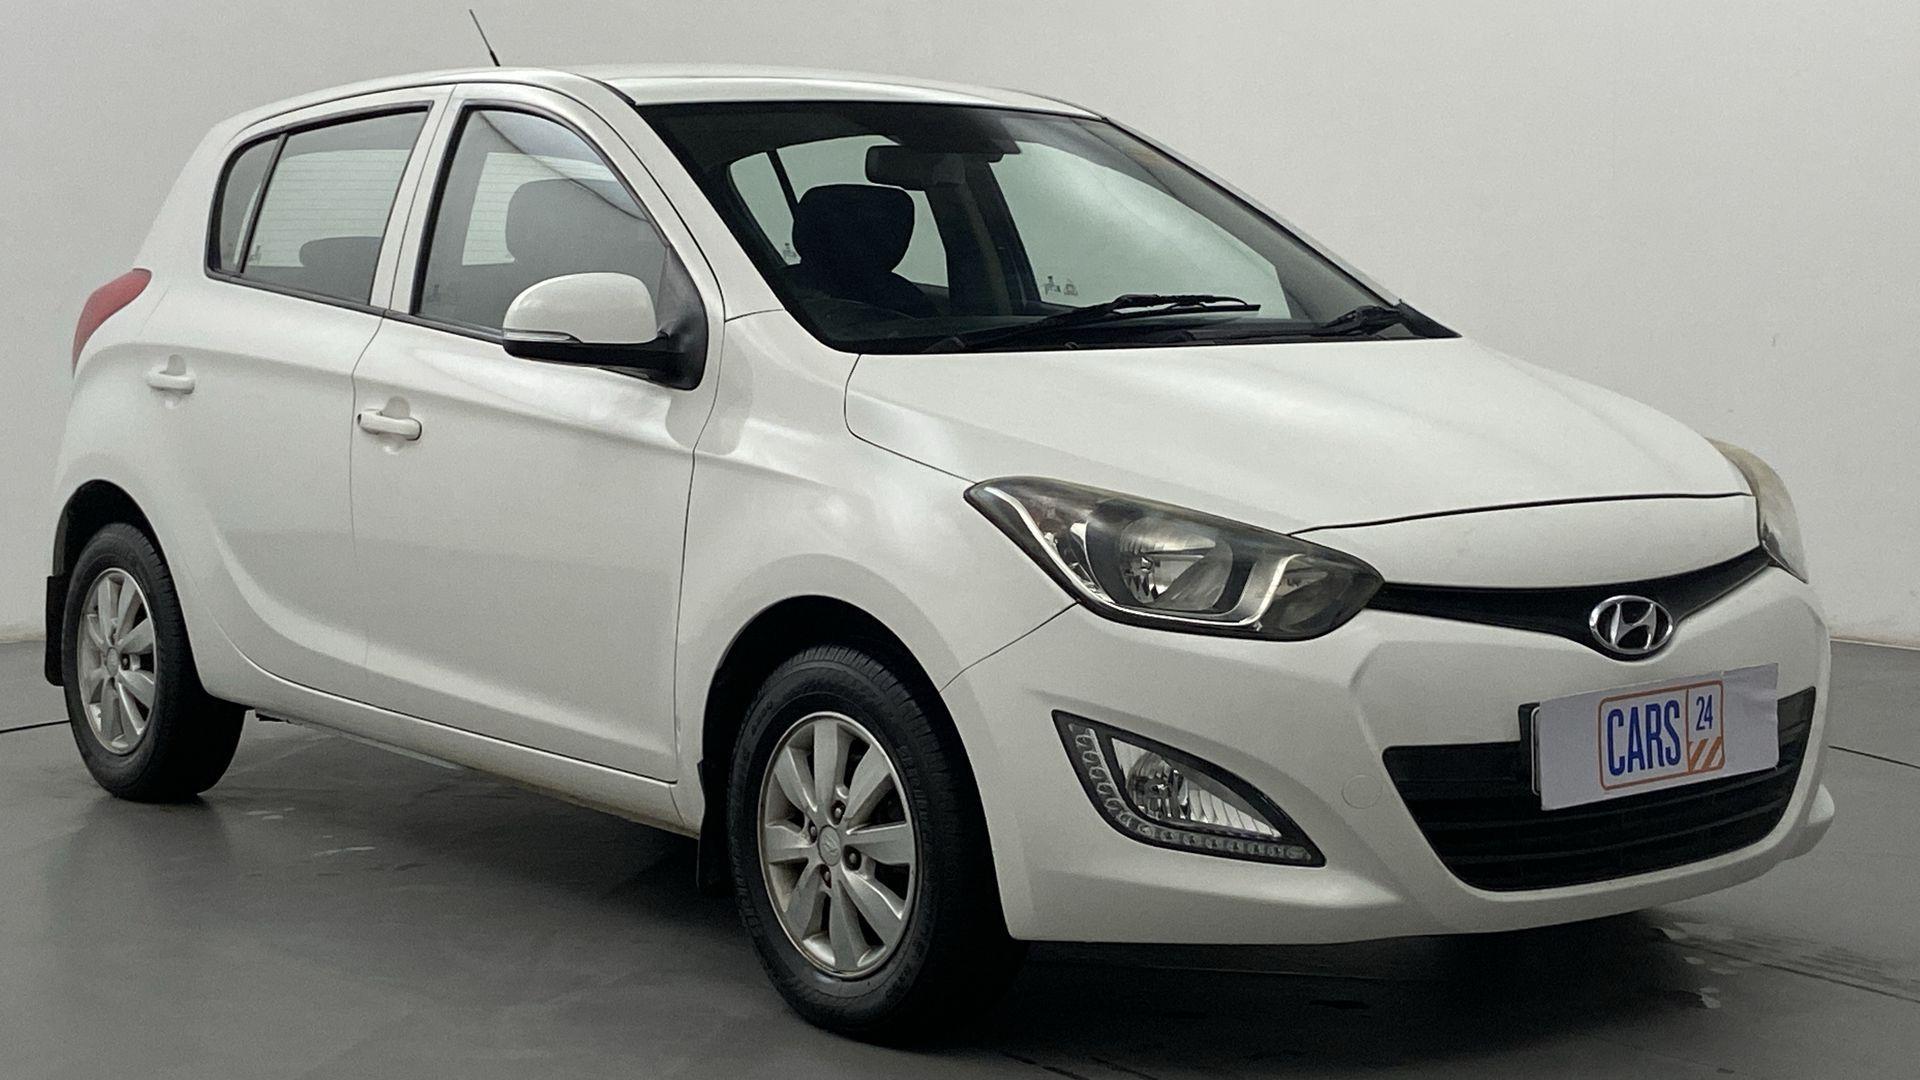 2012 Hyundai i20 SPORTZ 1.4 CRDI